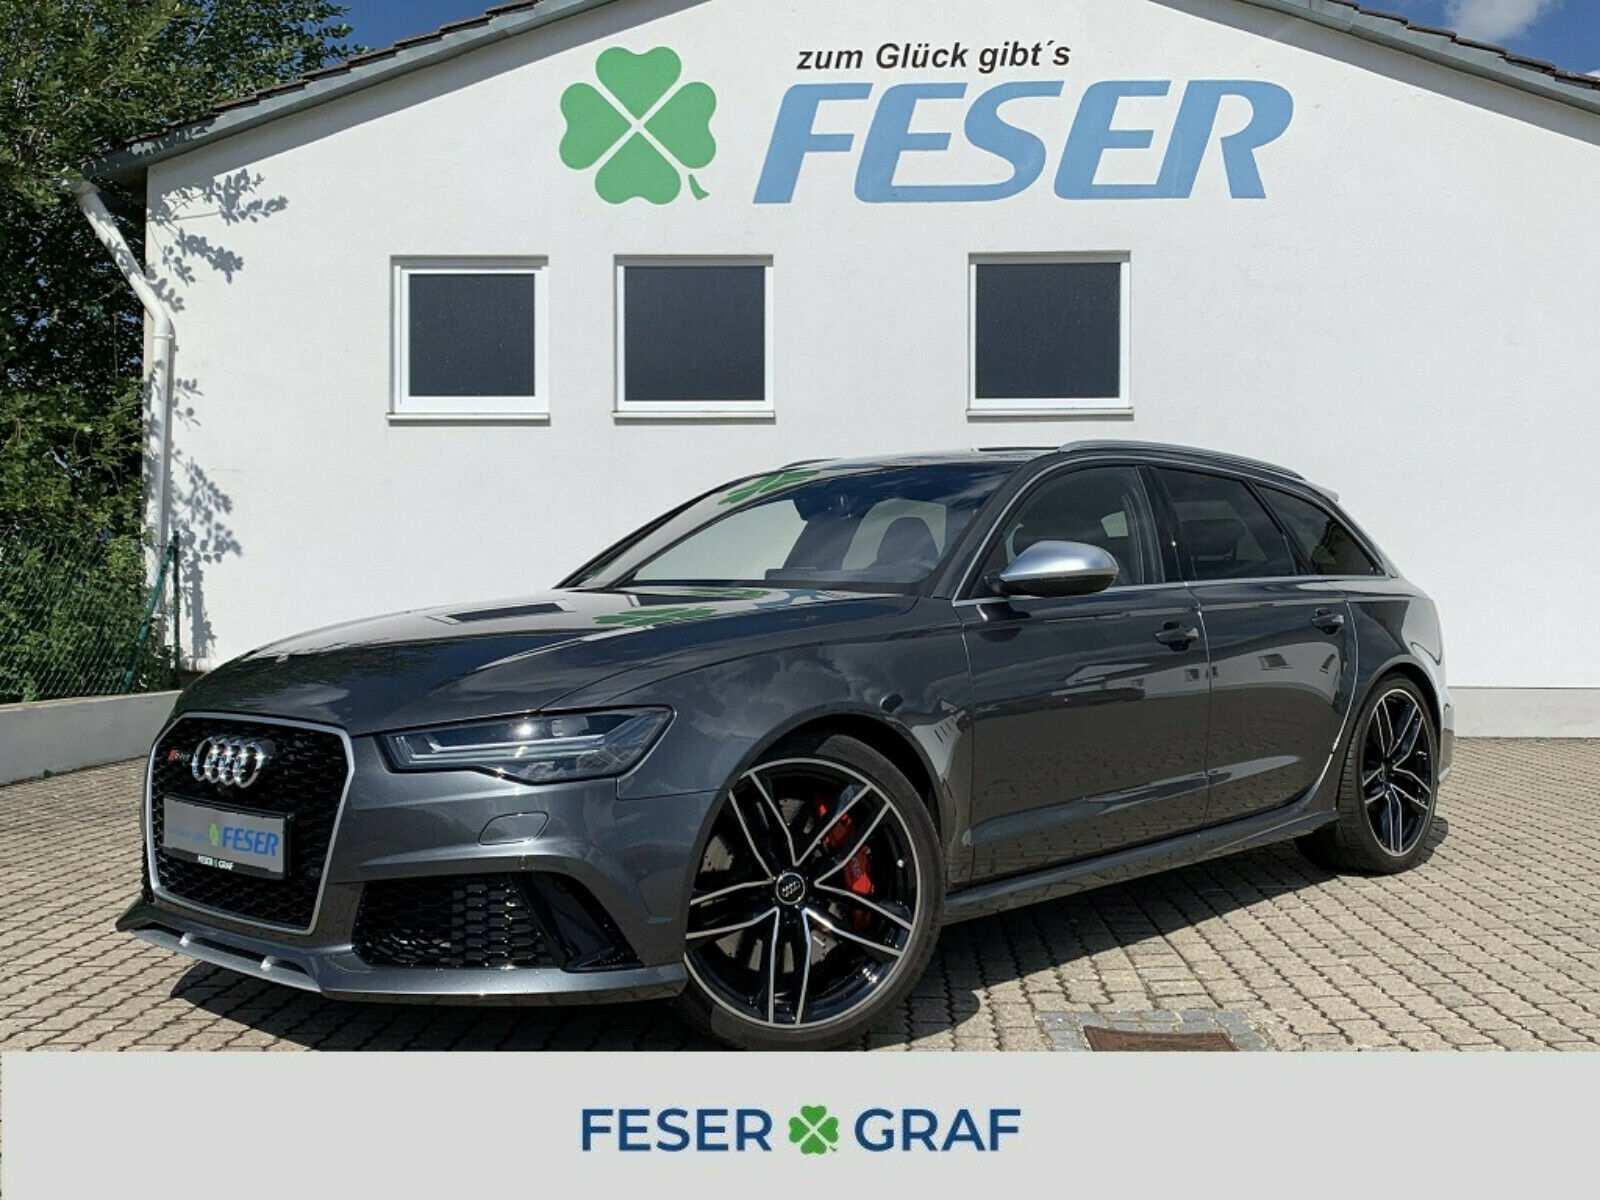 Audi RS6 Avant 4,0TFSI quattro BOSE/PANO/MATRIX/ABGAS, Jahr 2016, Benzin